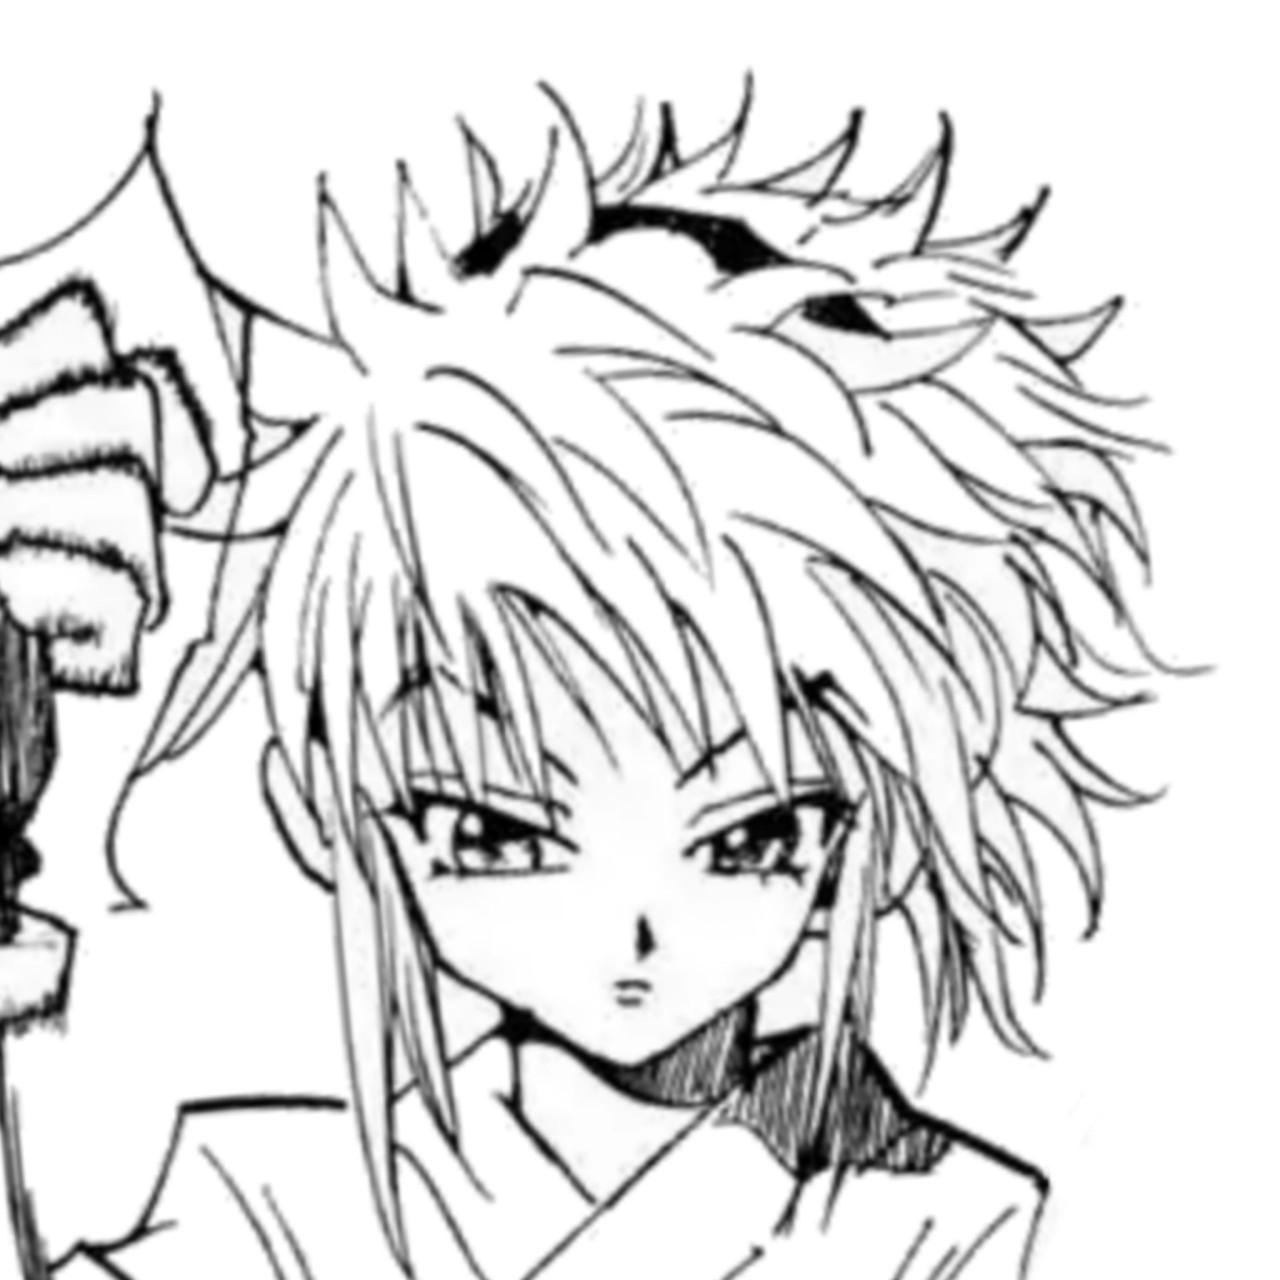 Anime Hunter Design 5 خلفيات وخلفيات